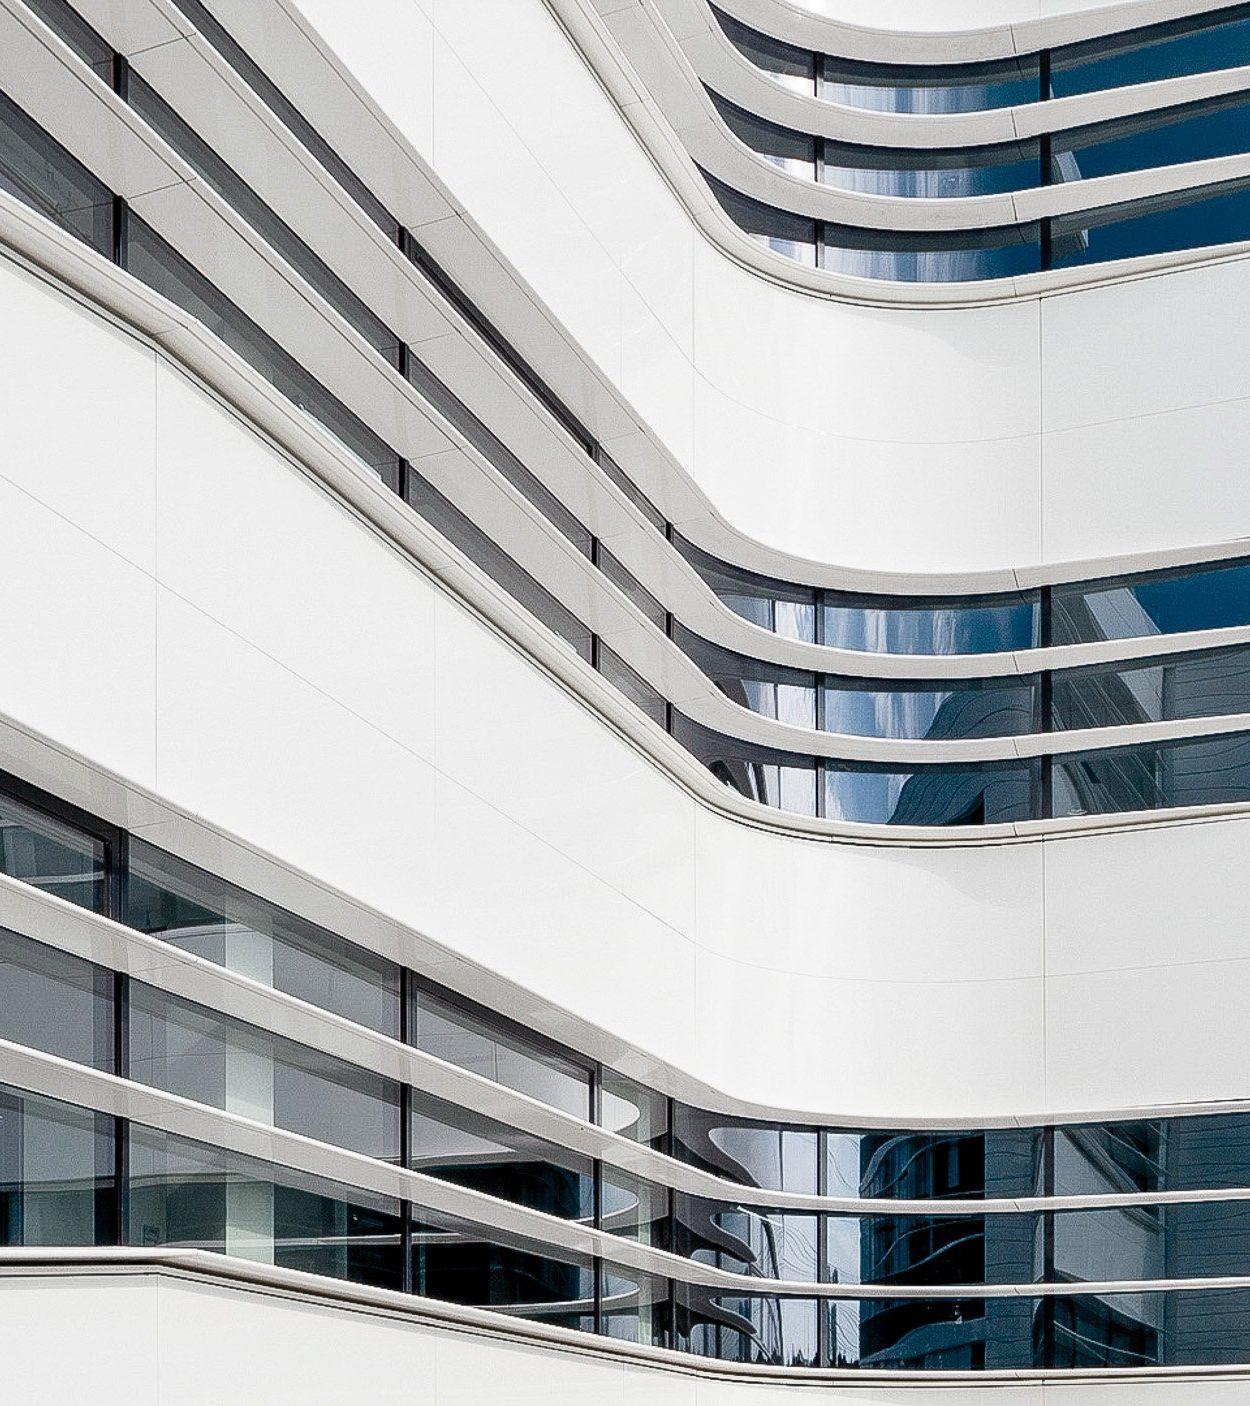 BSH Verwaltungs- und Forschungszentrum Berlin - Fassade